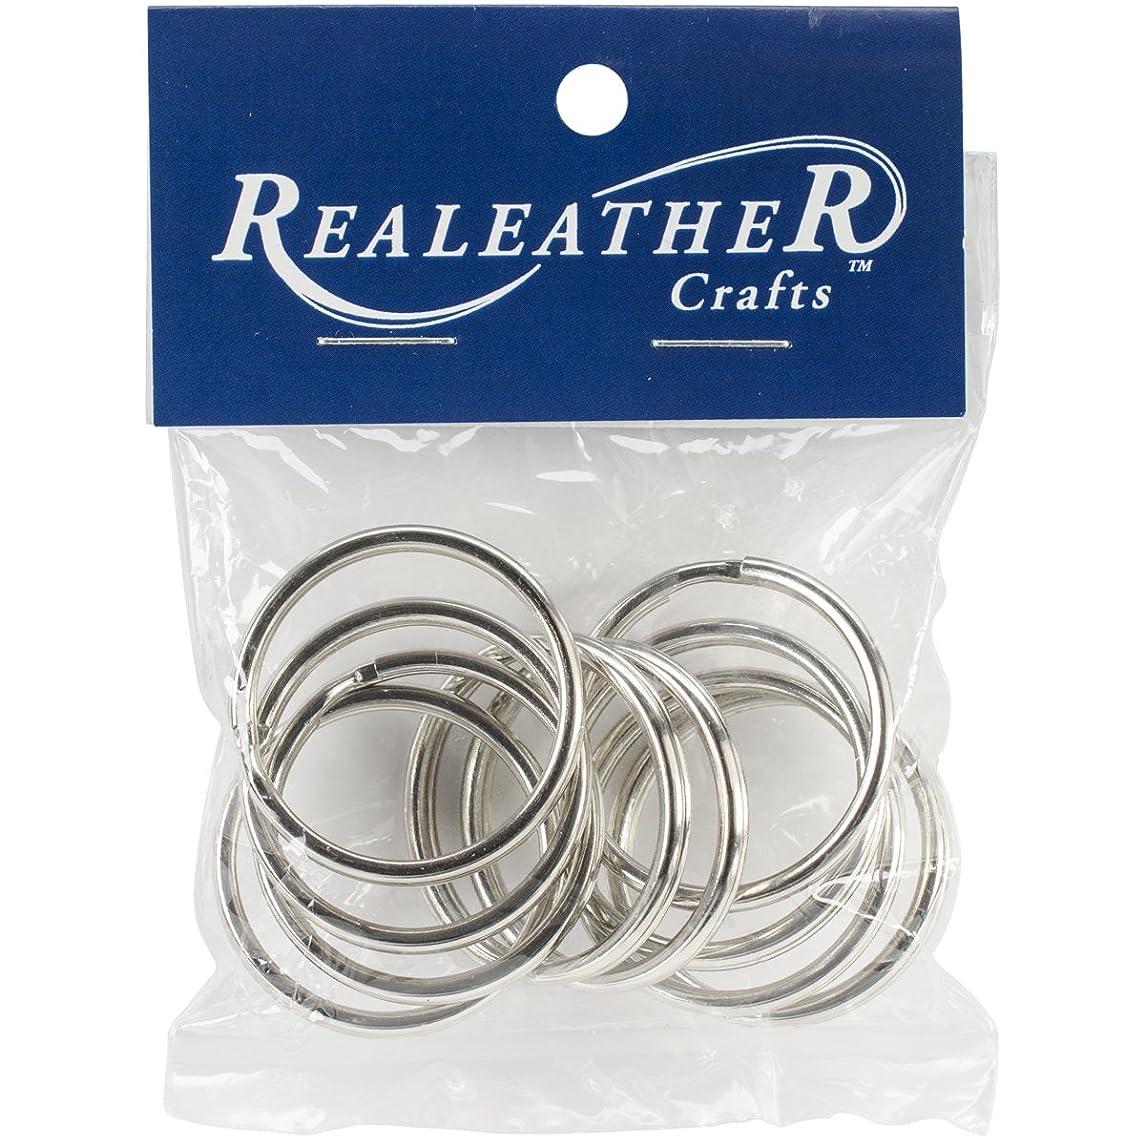 Realeather Crafts BKR12510 Split Key Rings (10 Pack), 1.25